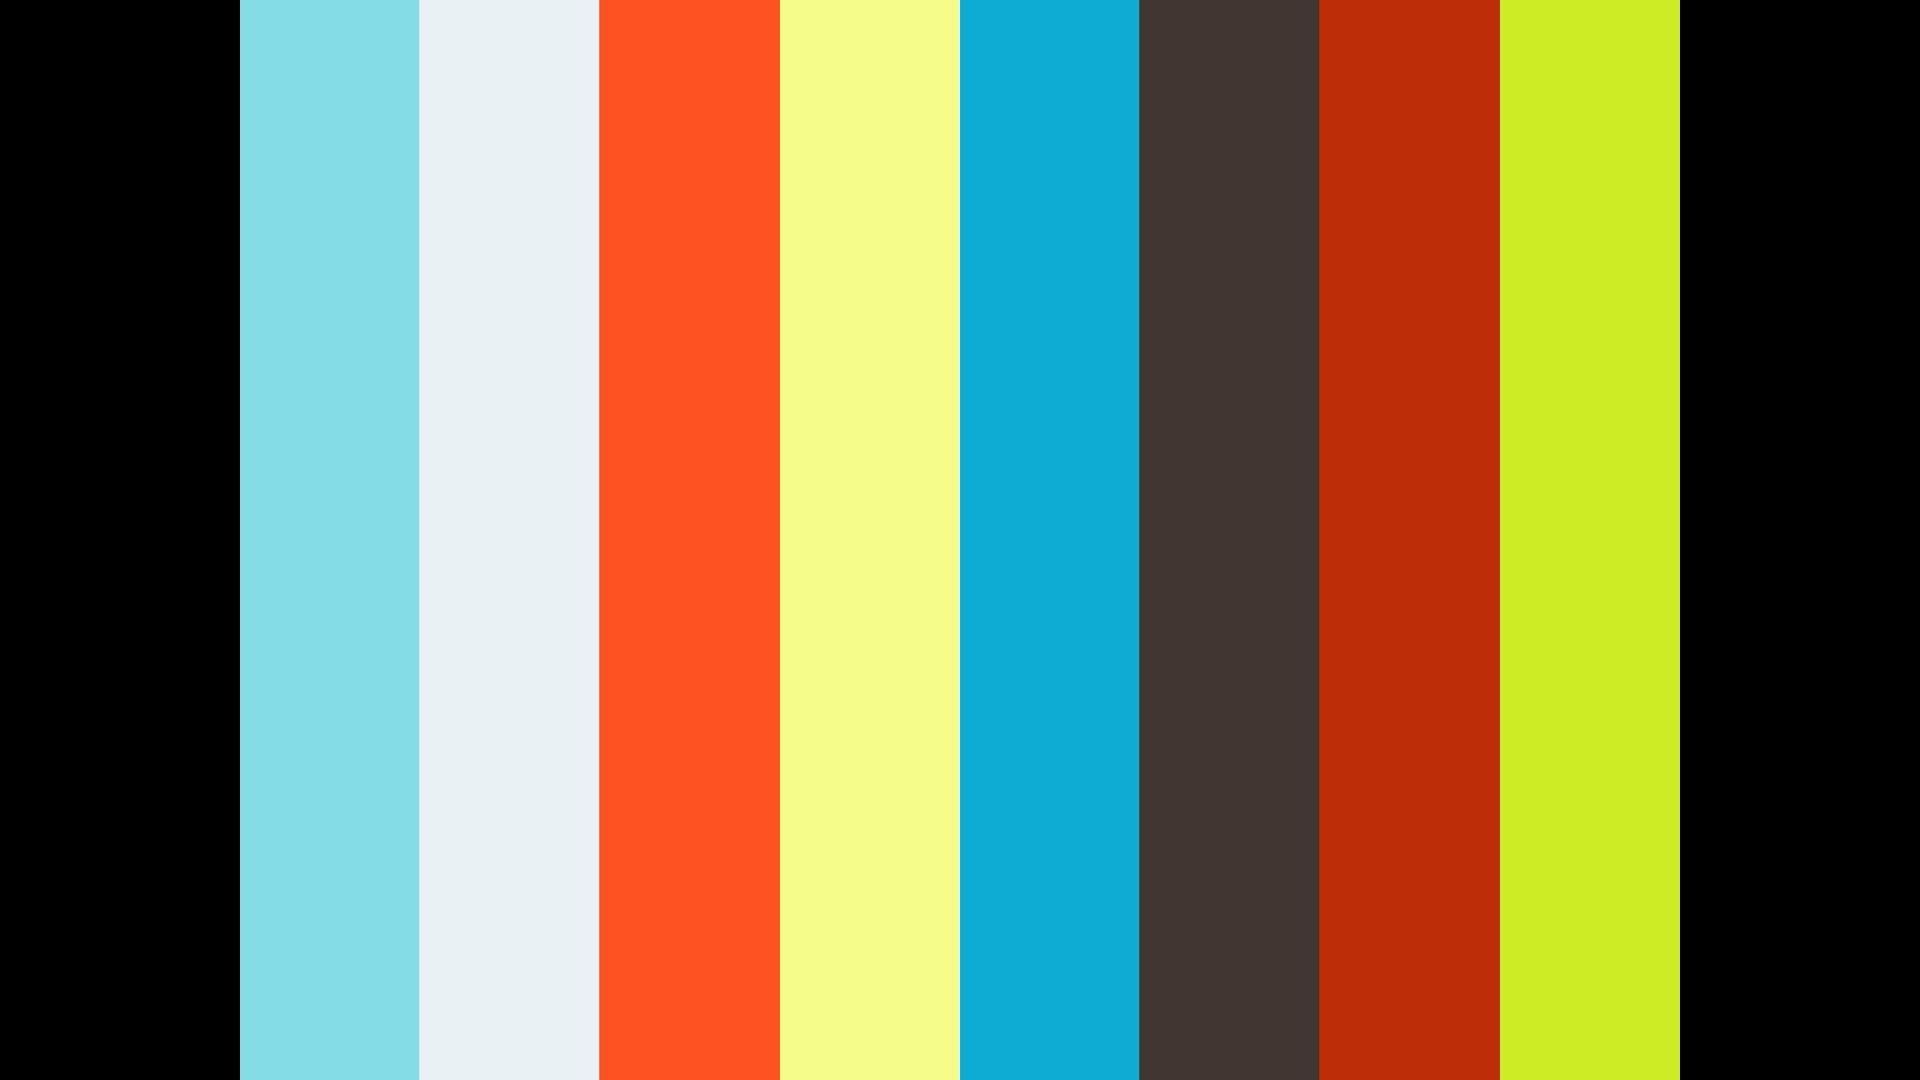 SEBRAE VIVO - Certificação LEED - Time Lapse